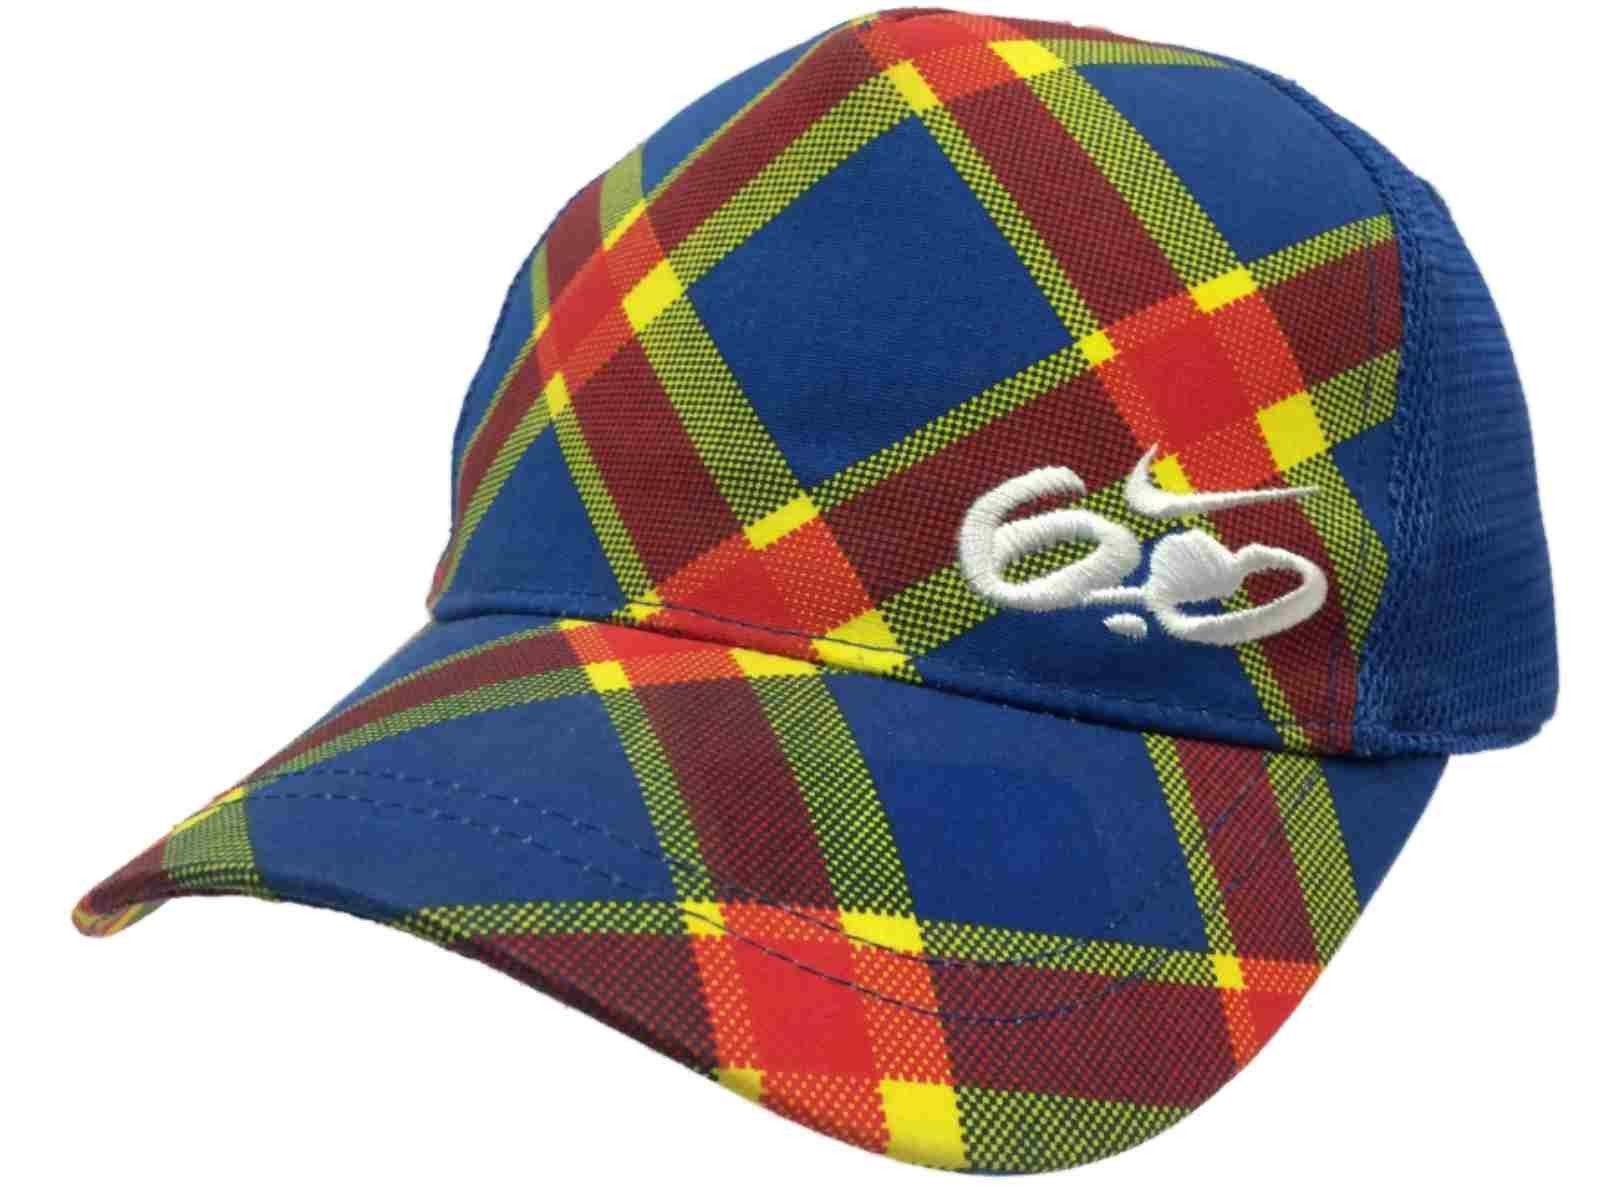 efabab3b4c6 ... black sonic yellow 49792 1b12b  czech nike 6.0 youth red yellow blue  plaid mesh adjustable hat cap 8 20 60fea 67fdd